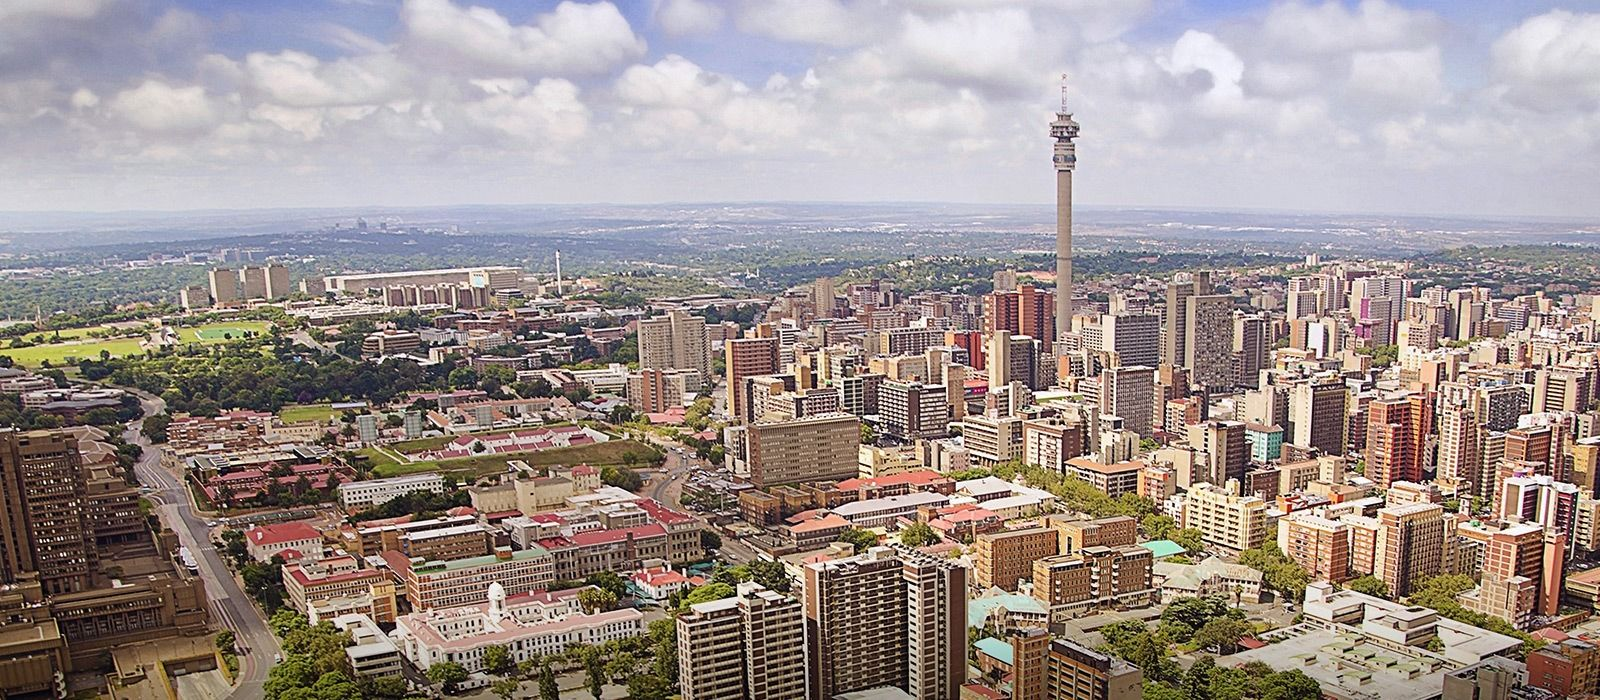 Große Südafrika Rundreise – Johannesburg nach Kapstadt Urlaub 1